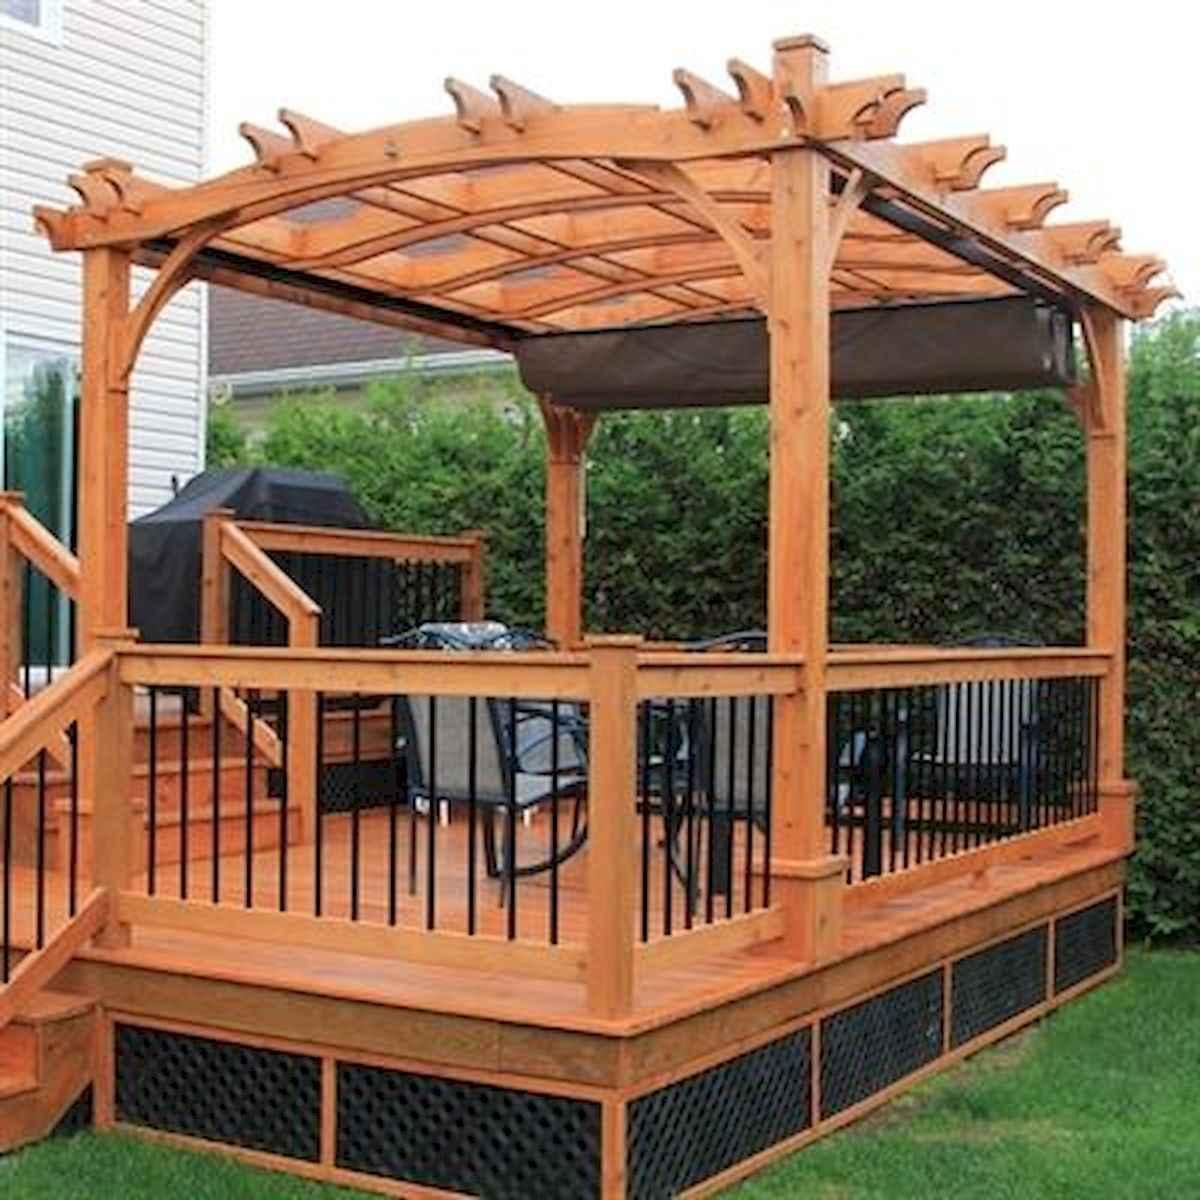 60 Amazing DIY Projects Otdoors Furniture Design Ideas (50)